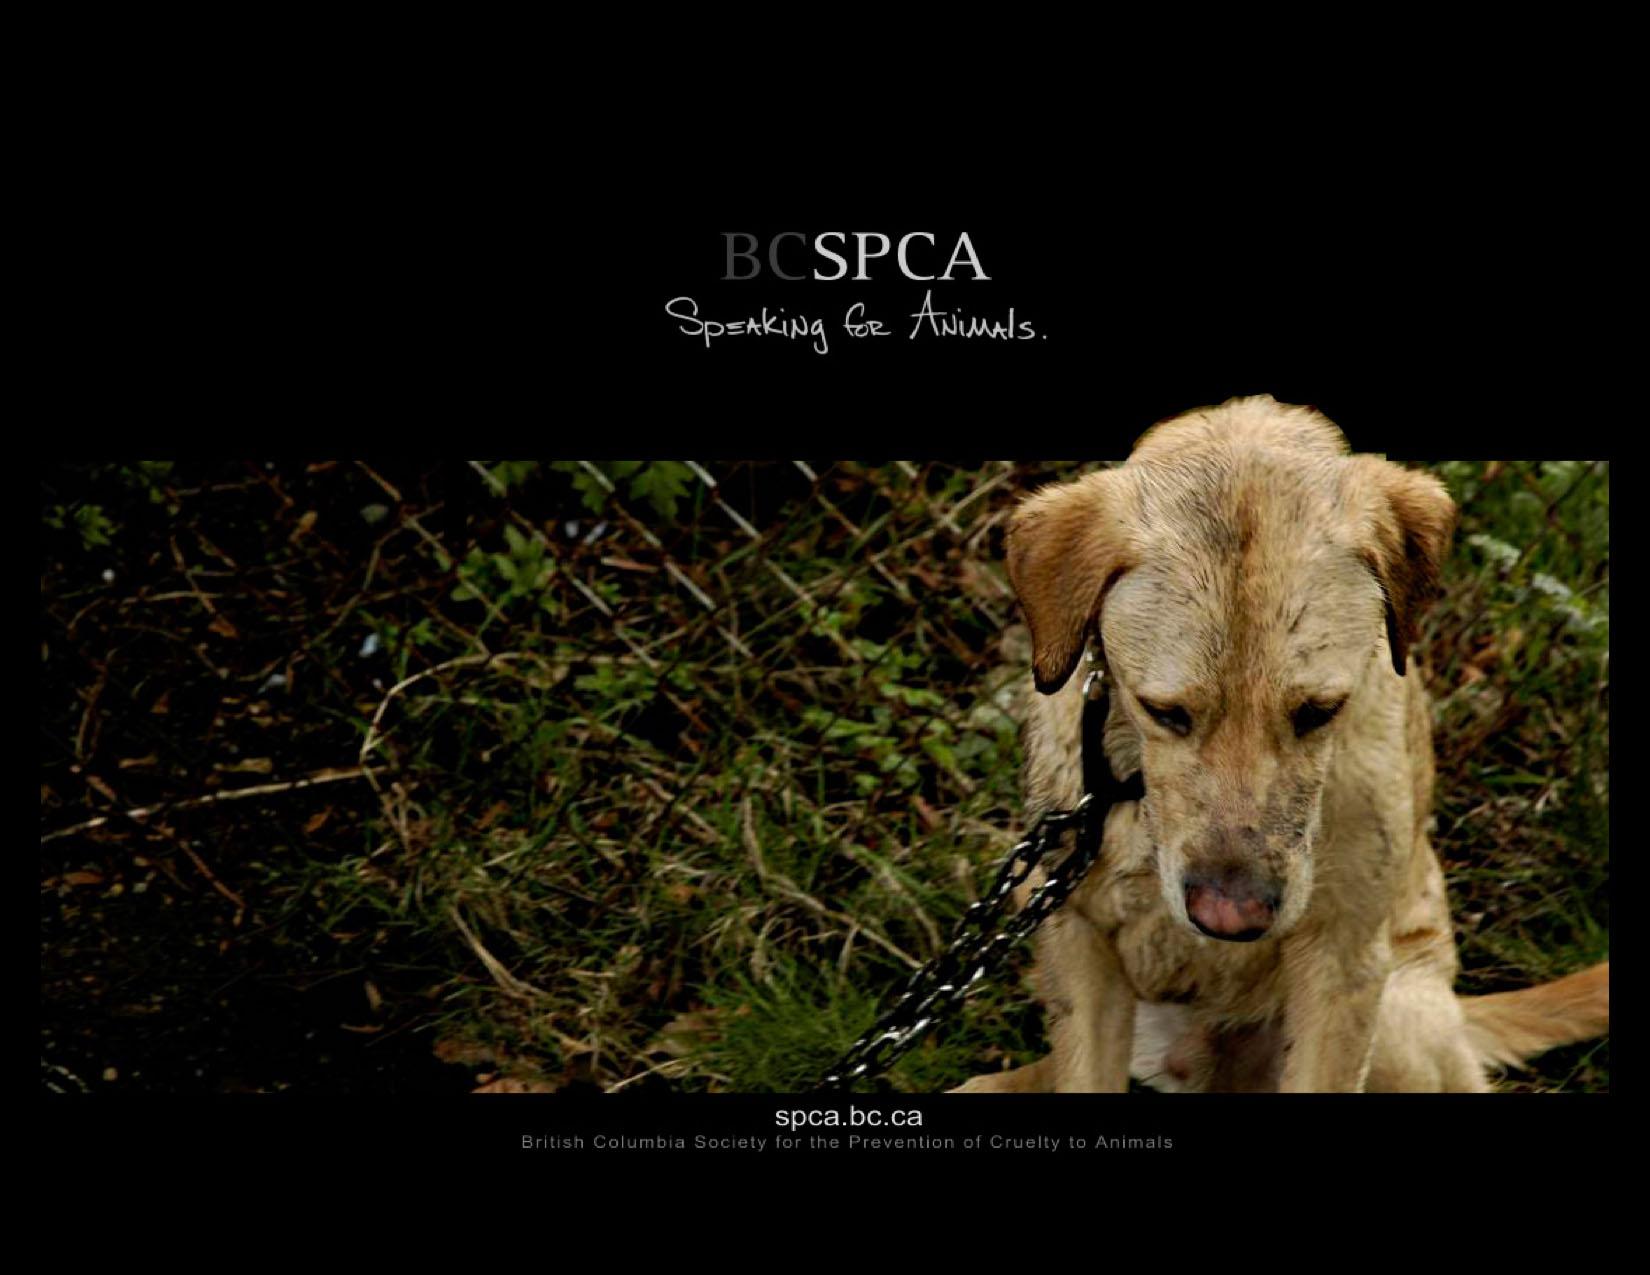 BCSPCA